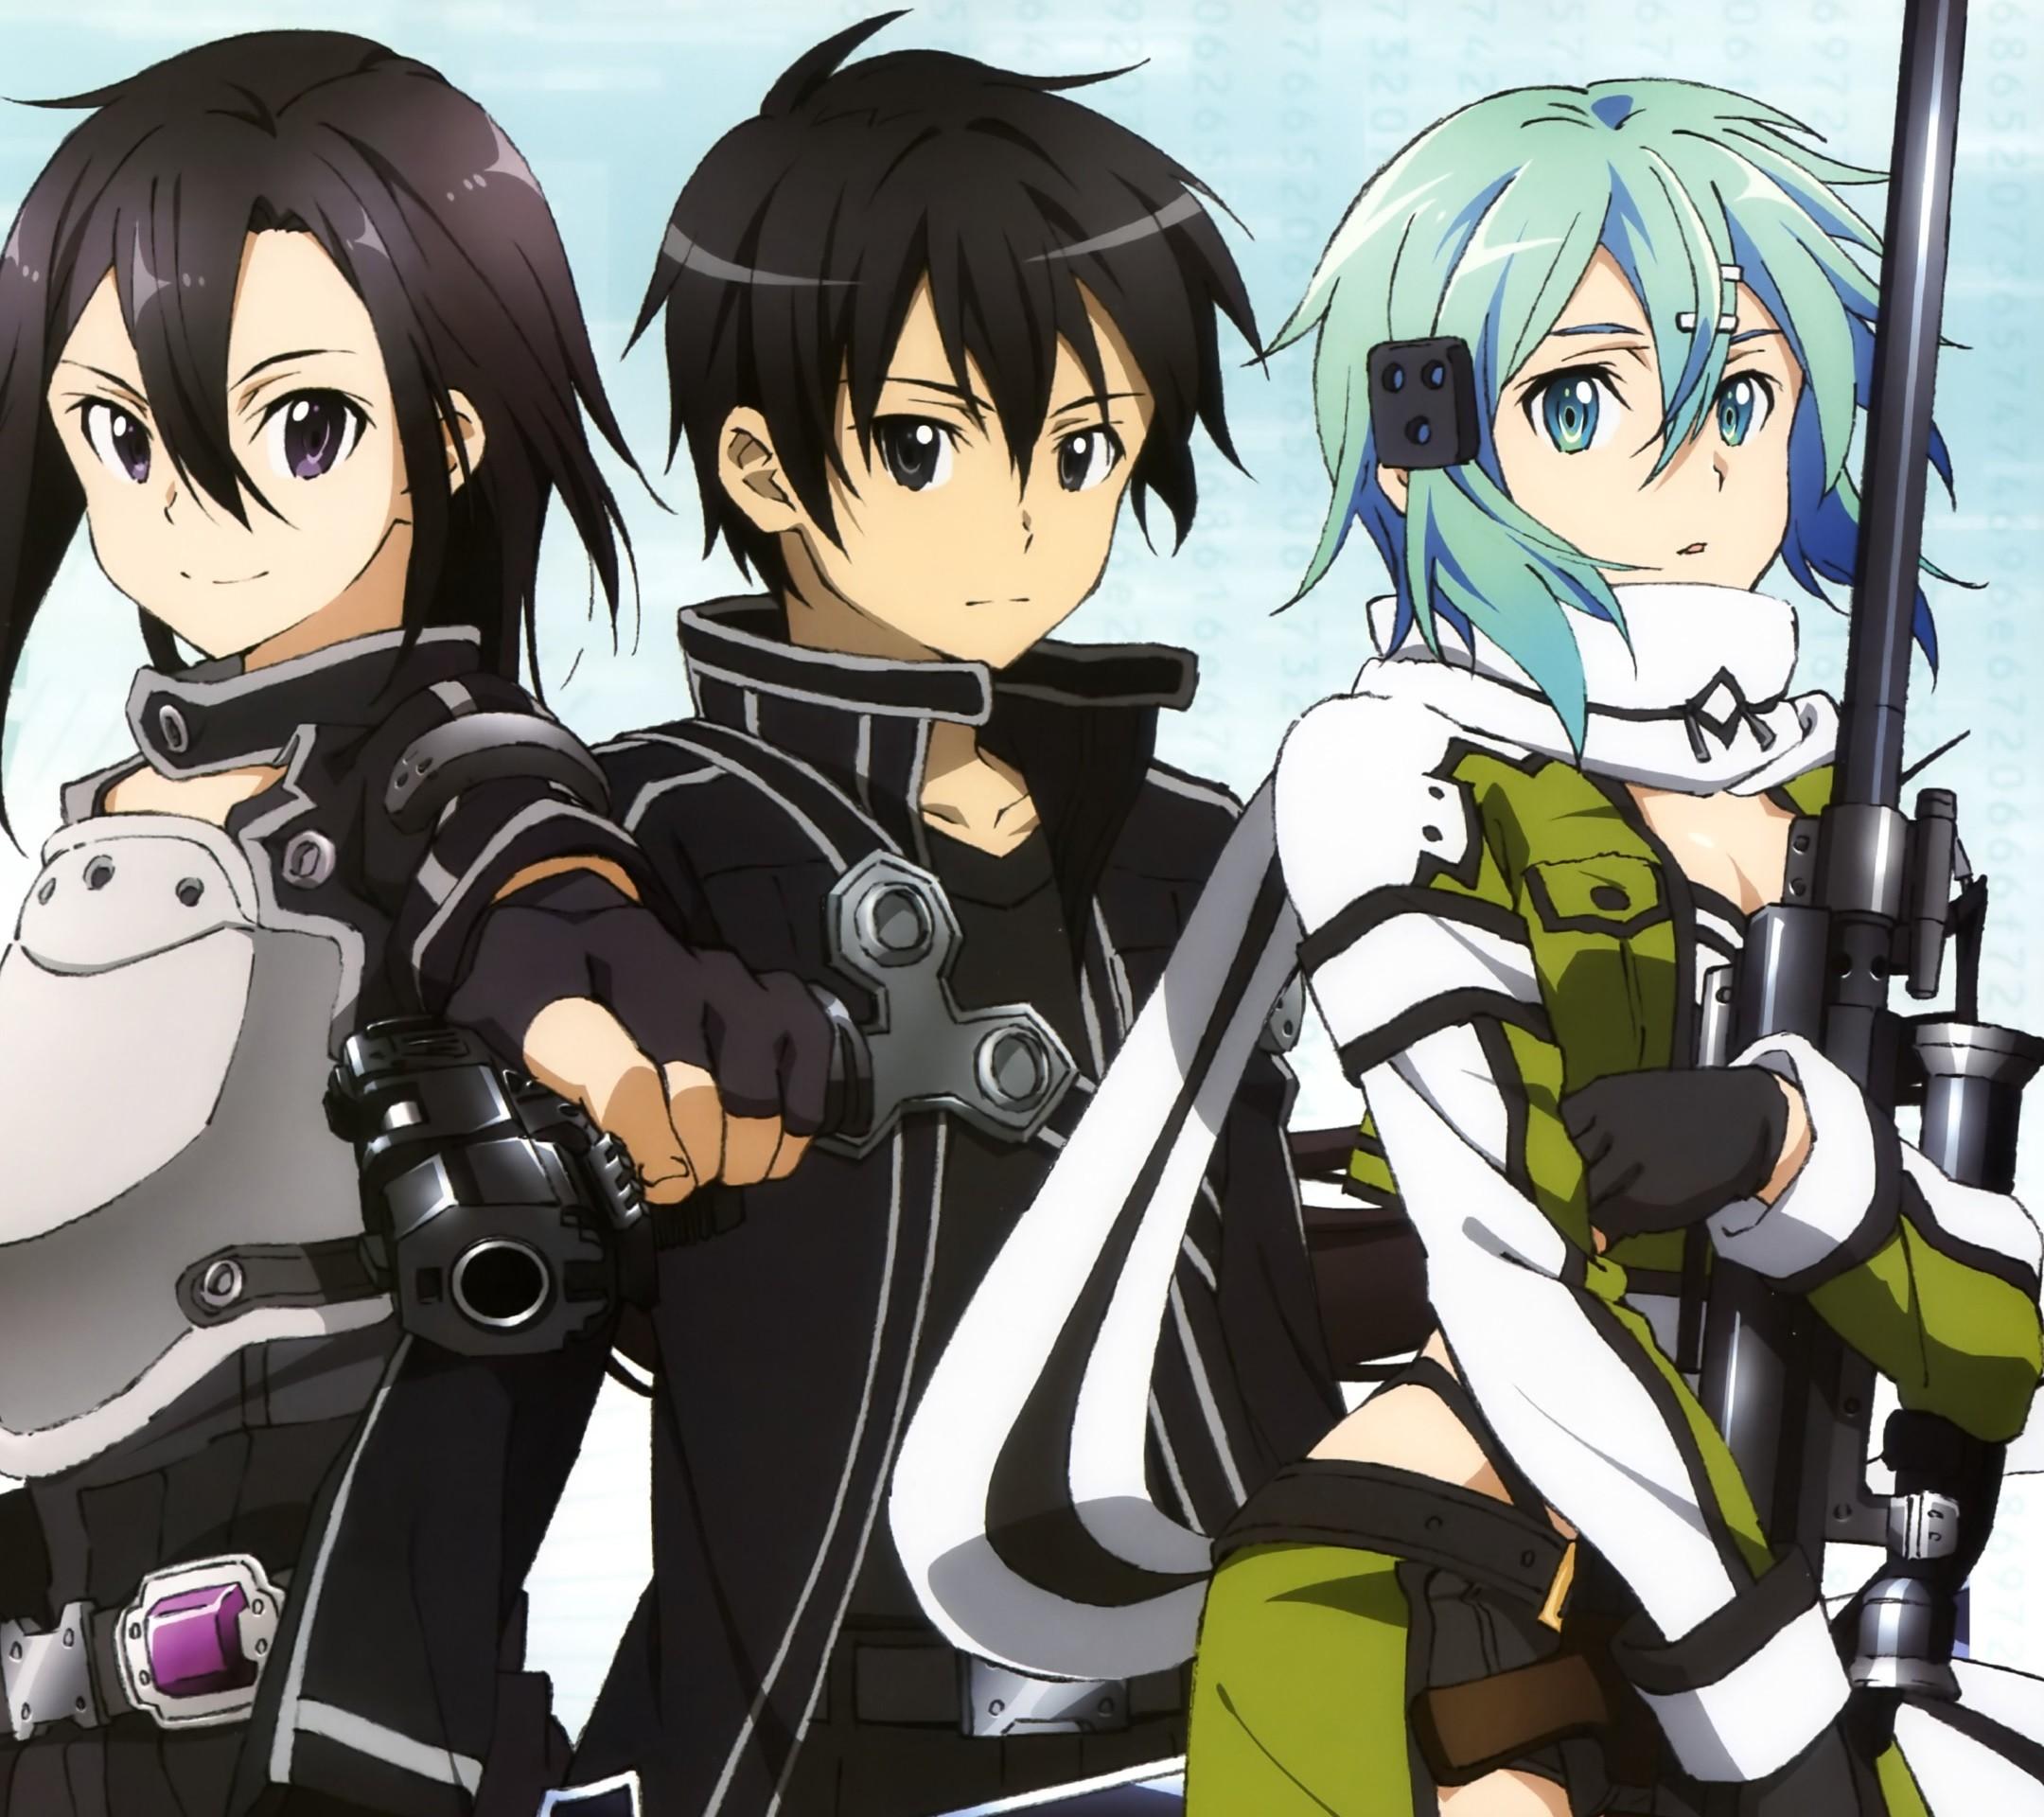 Sword Art Online 2 Kirito Sinon.Android wallpaper 2160×1920